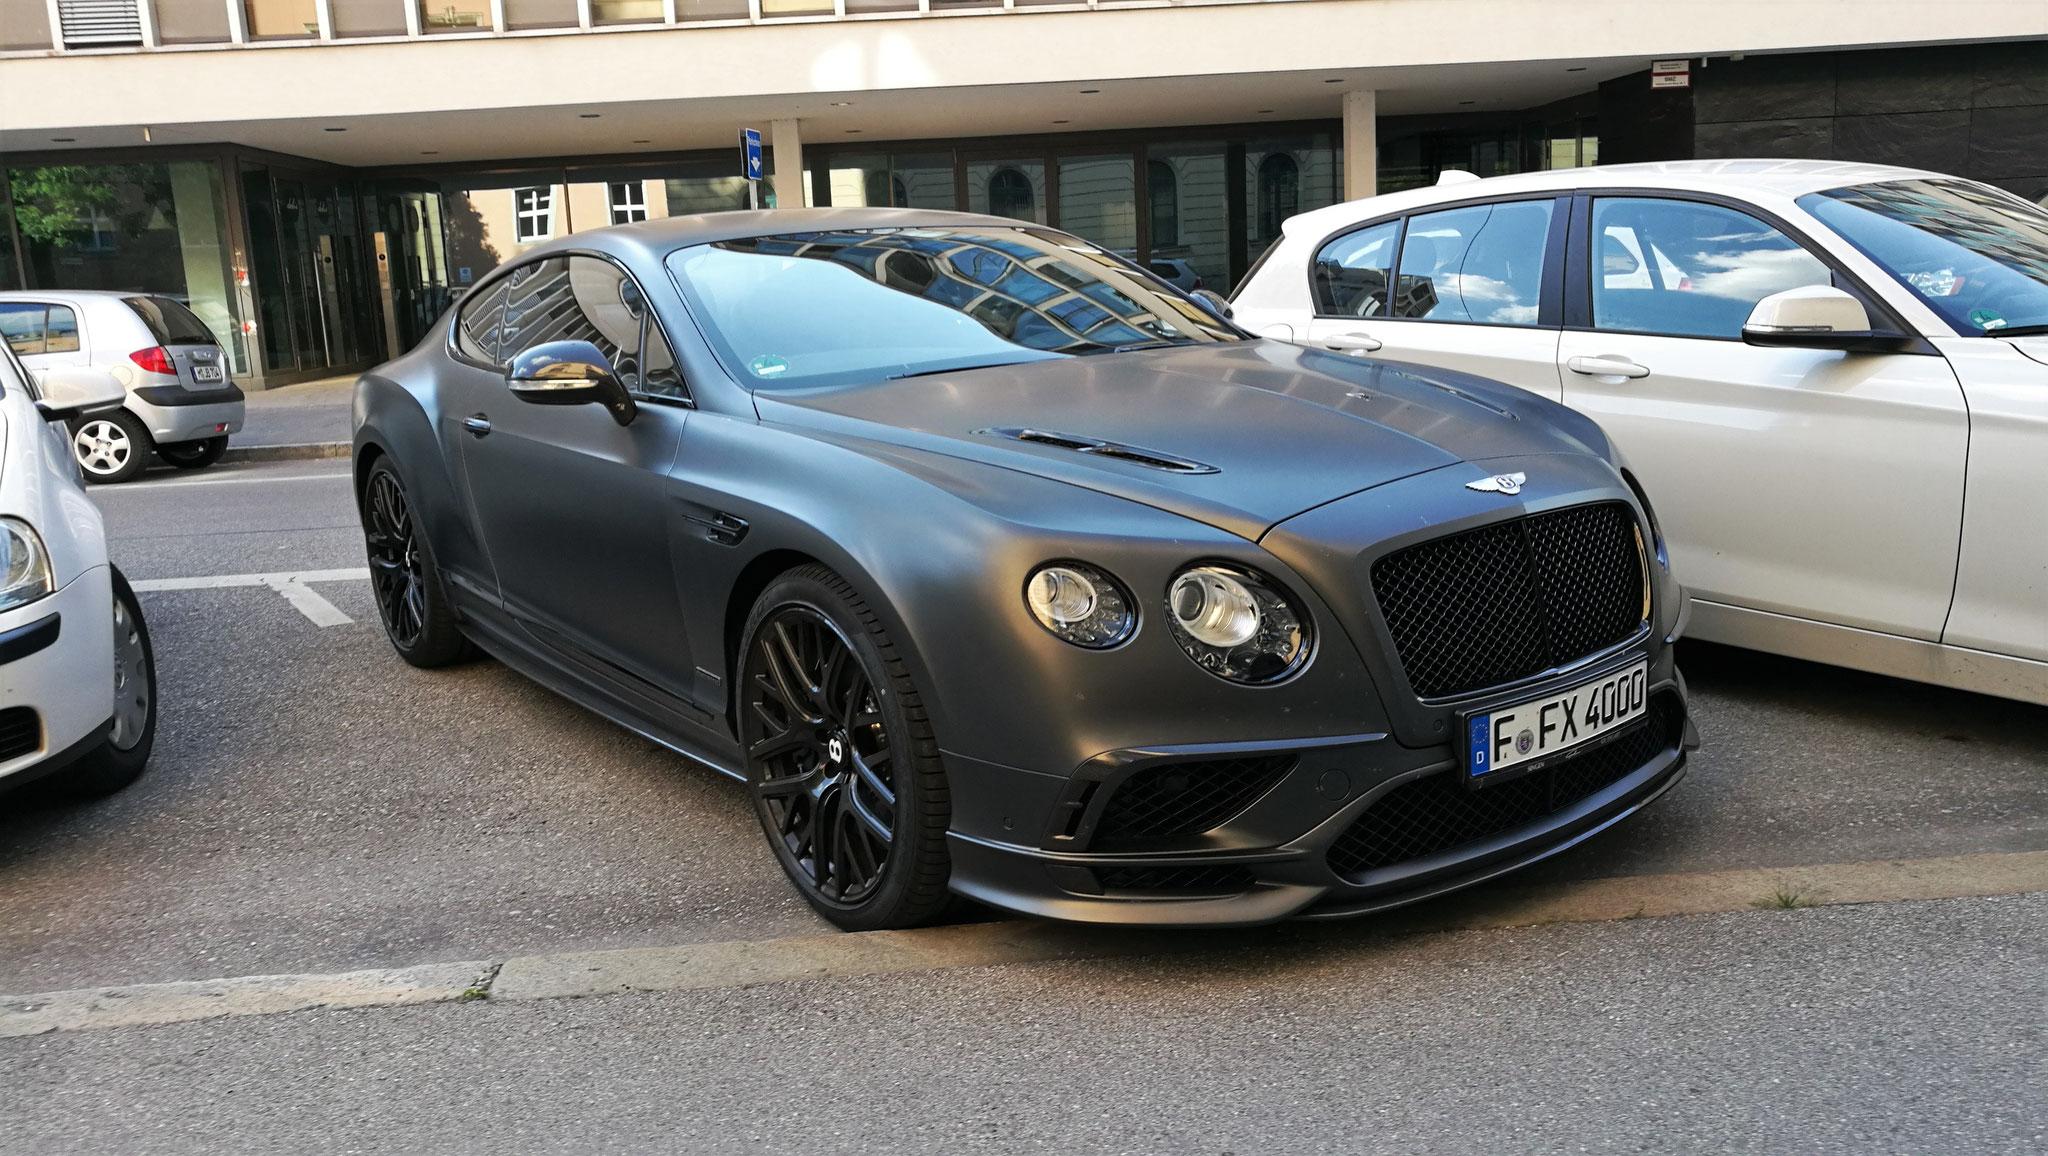 Bentley Continental GT Supersports - F-FX-4000